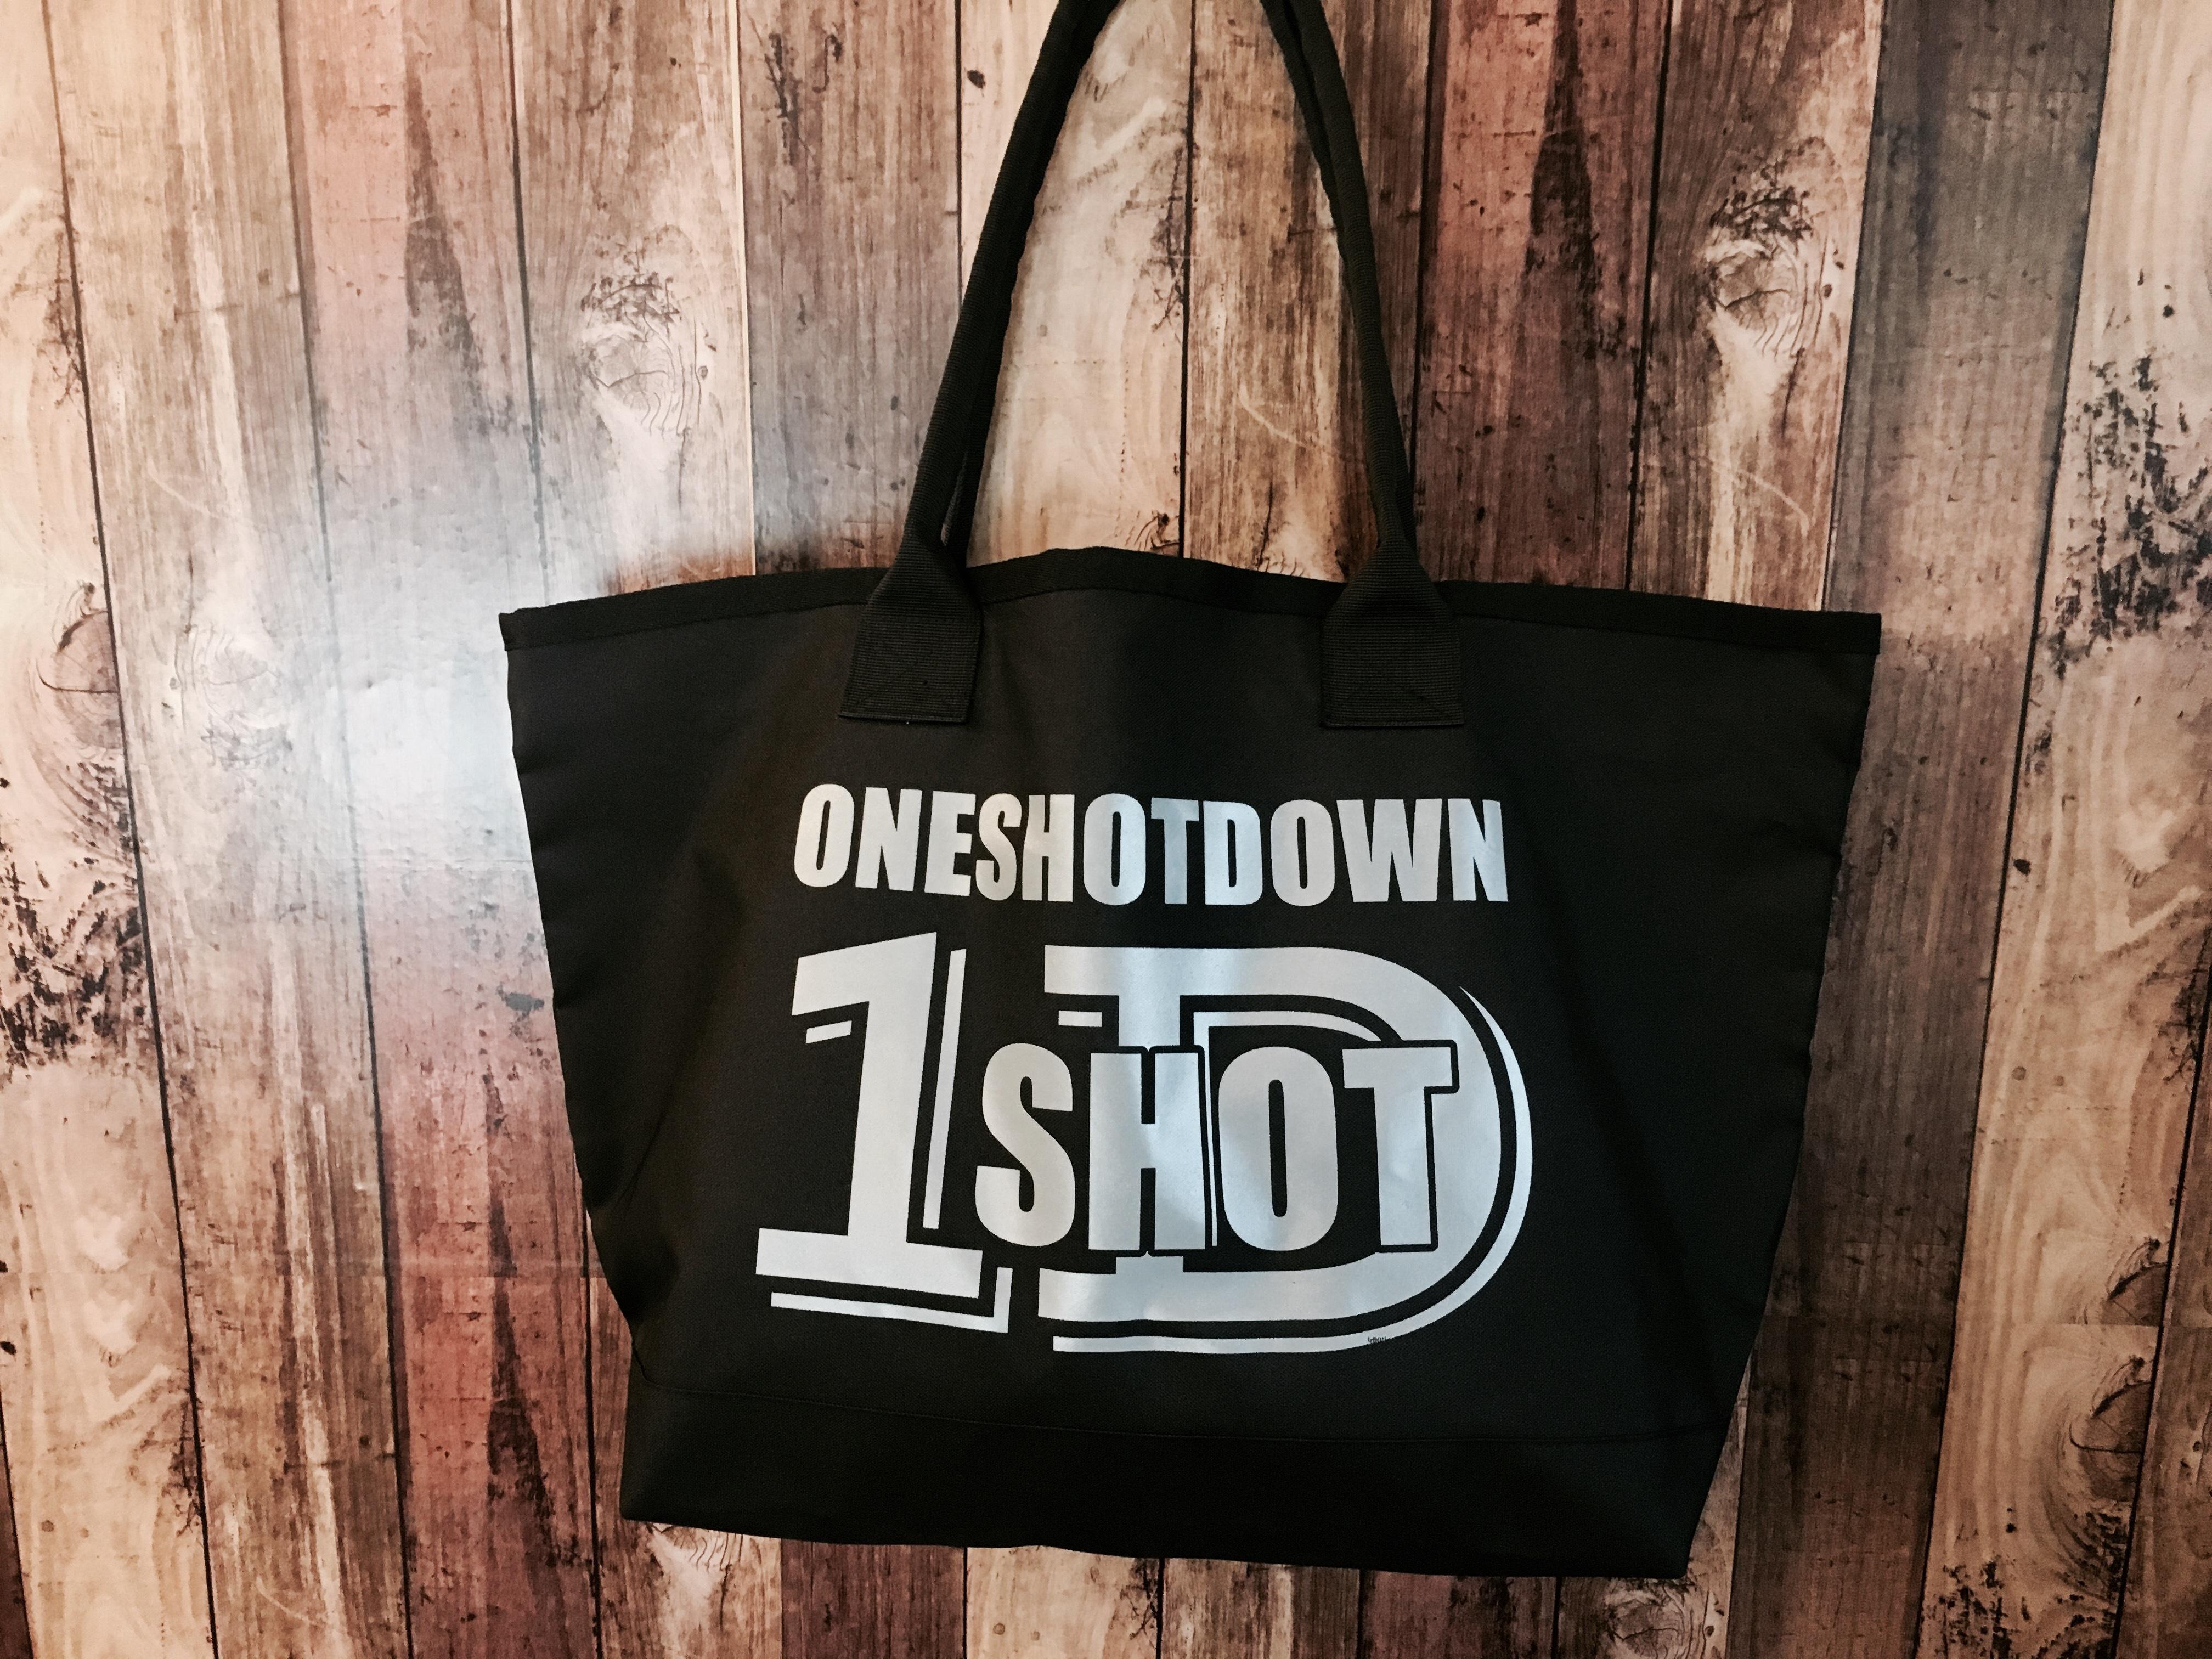 ONESHOTDOWN ポリエステルトールバッグ - 画像4